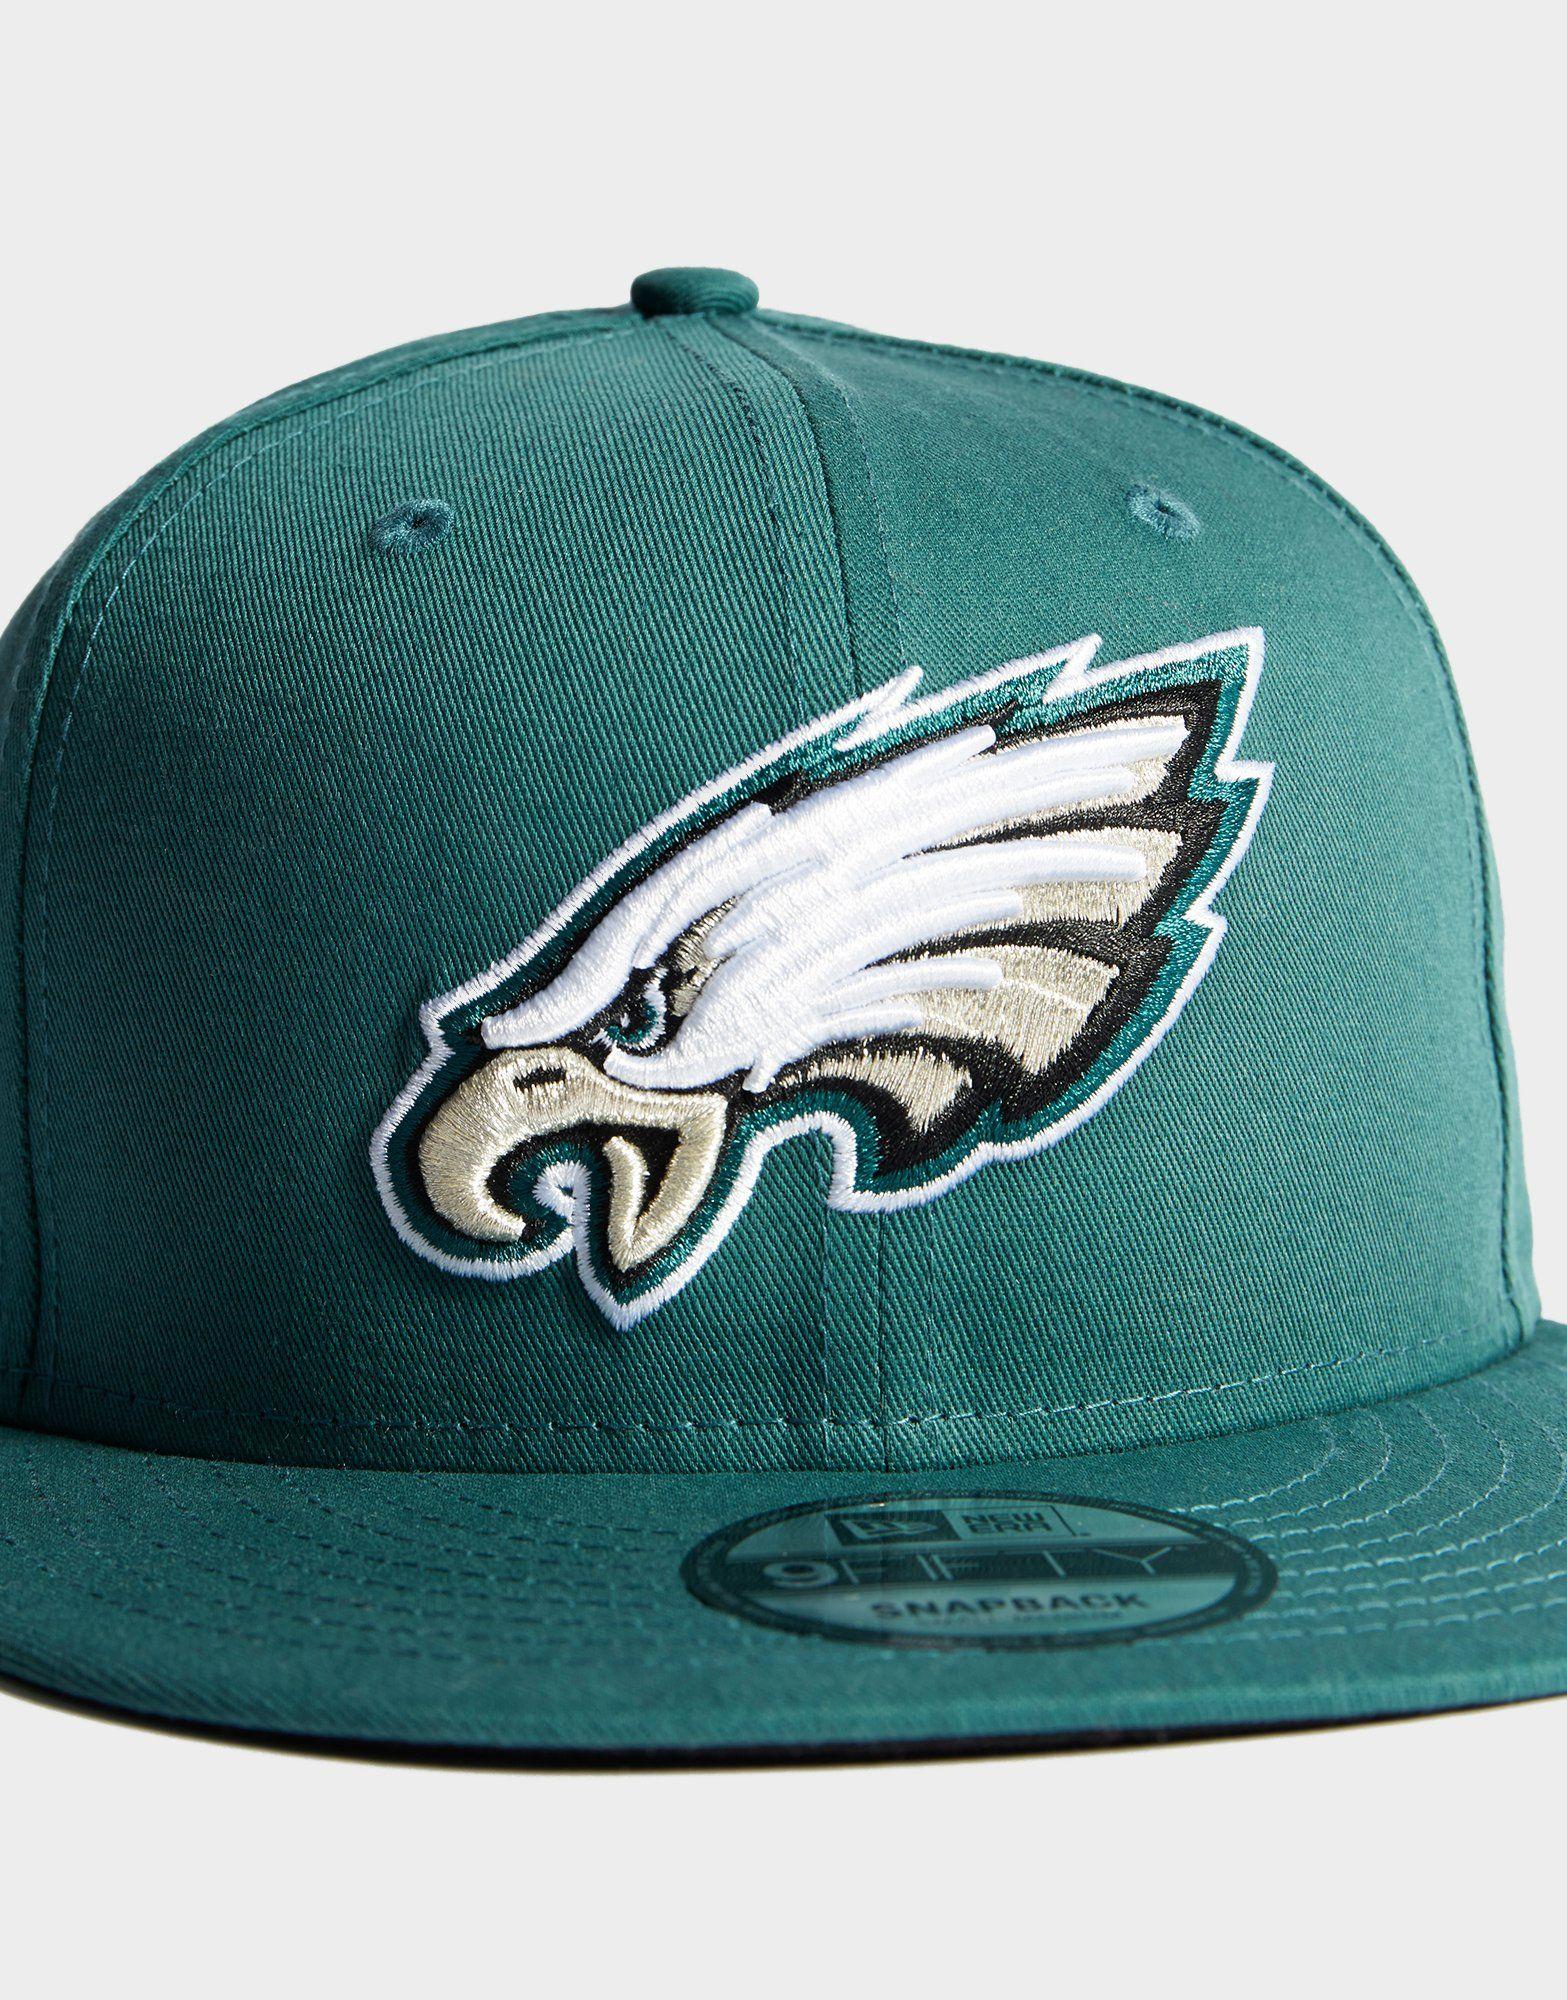 New Era Casquette NFL Philadelphia Eagles 9FIFTY Homme